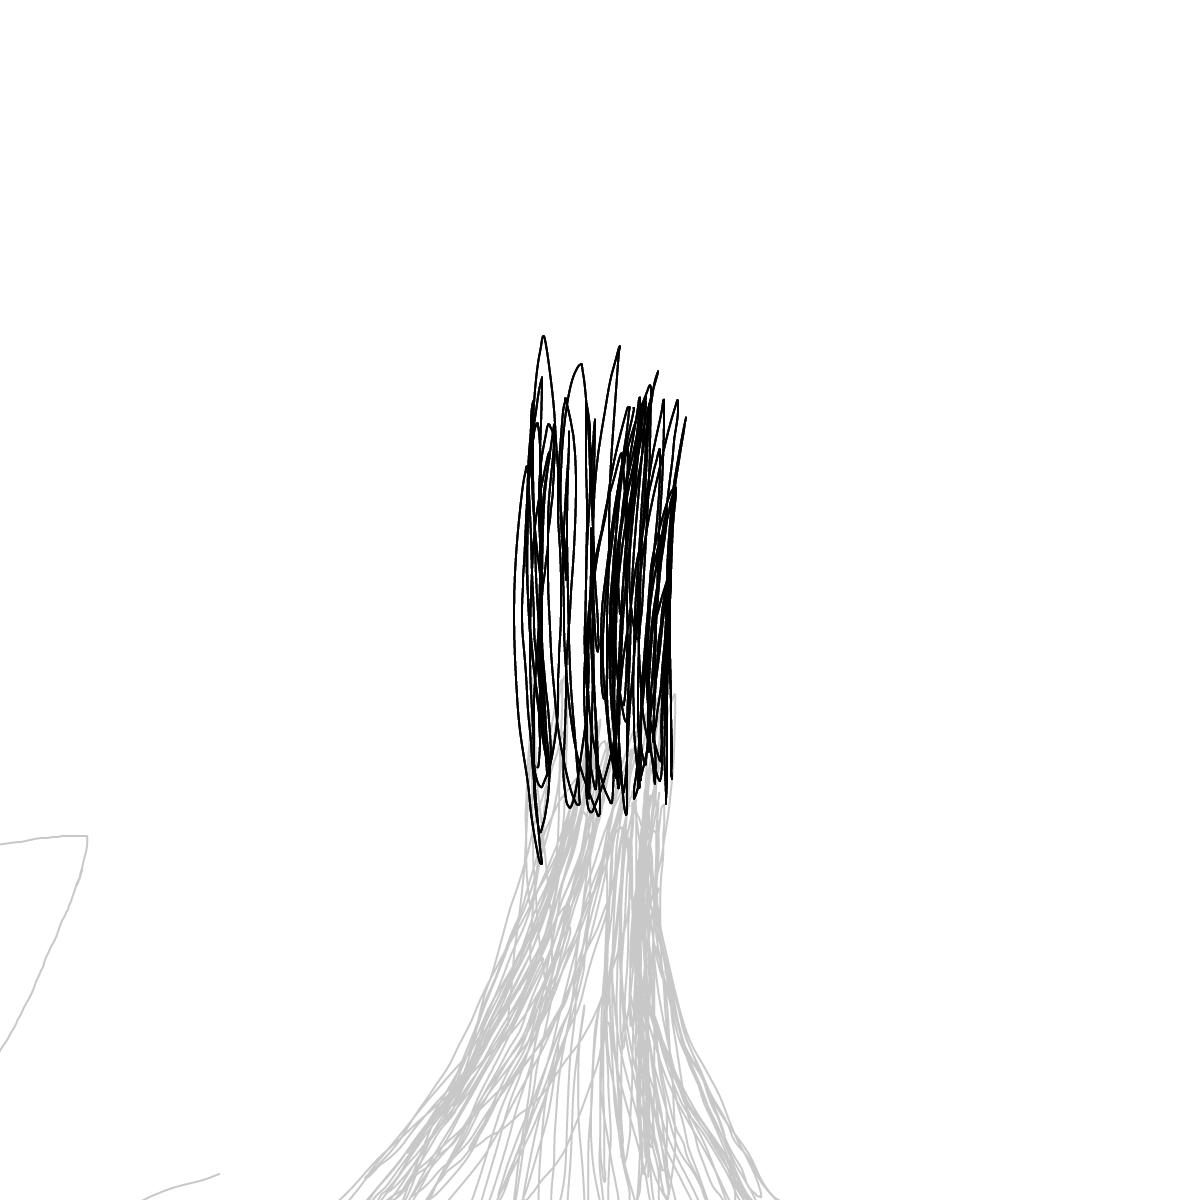 BAAAM drawing#16953 lat:51.2066917419433600lng: 3.2592964172363280